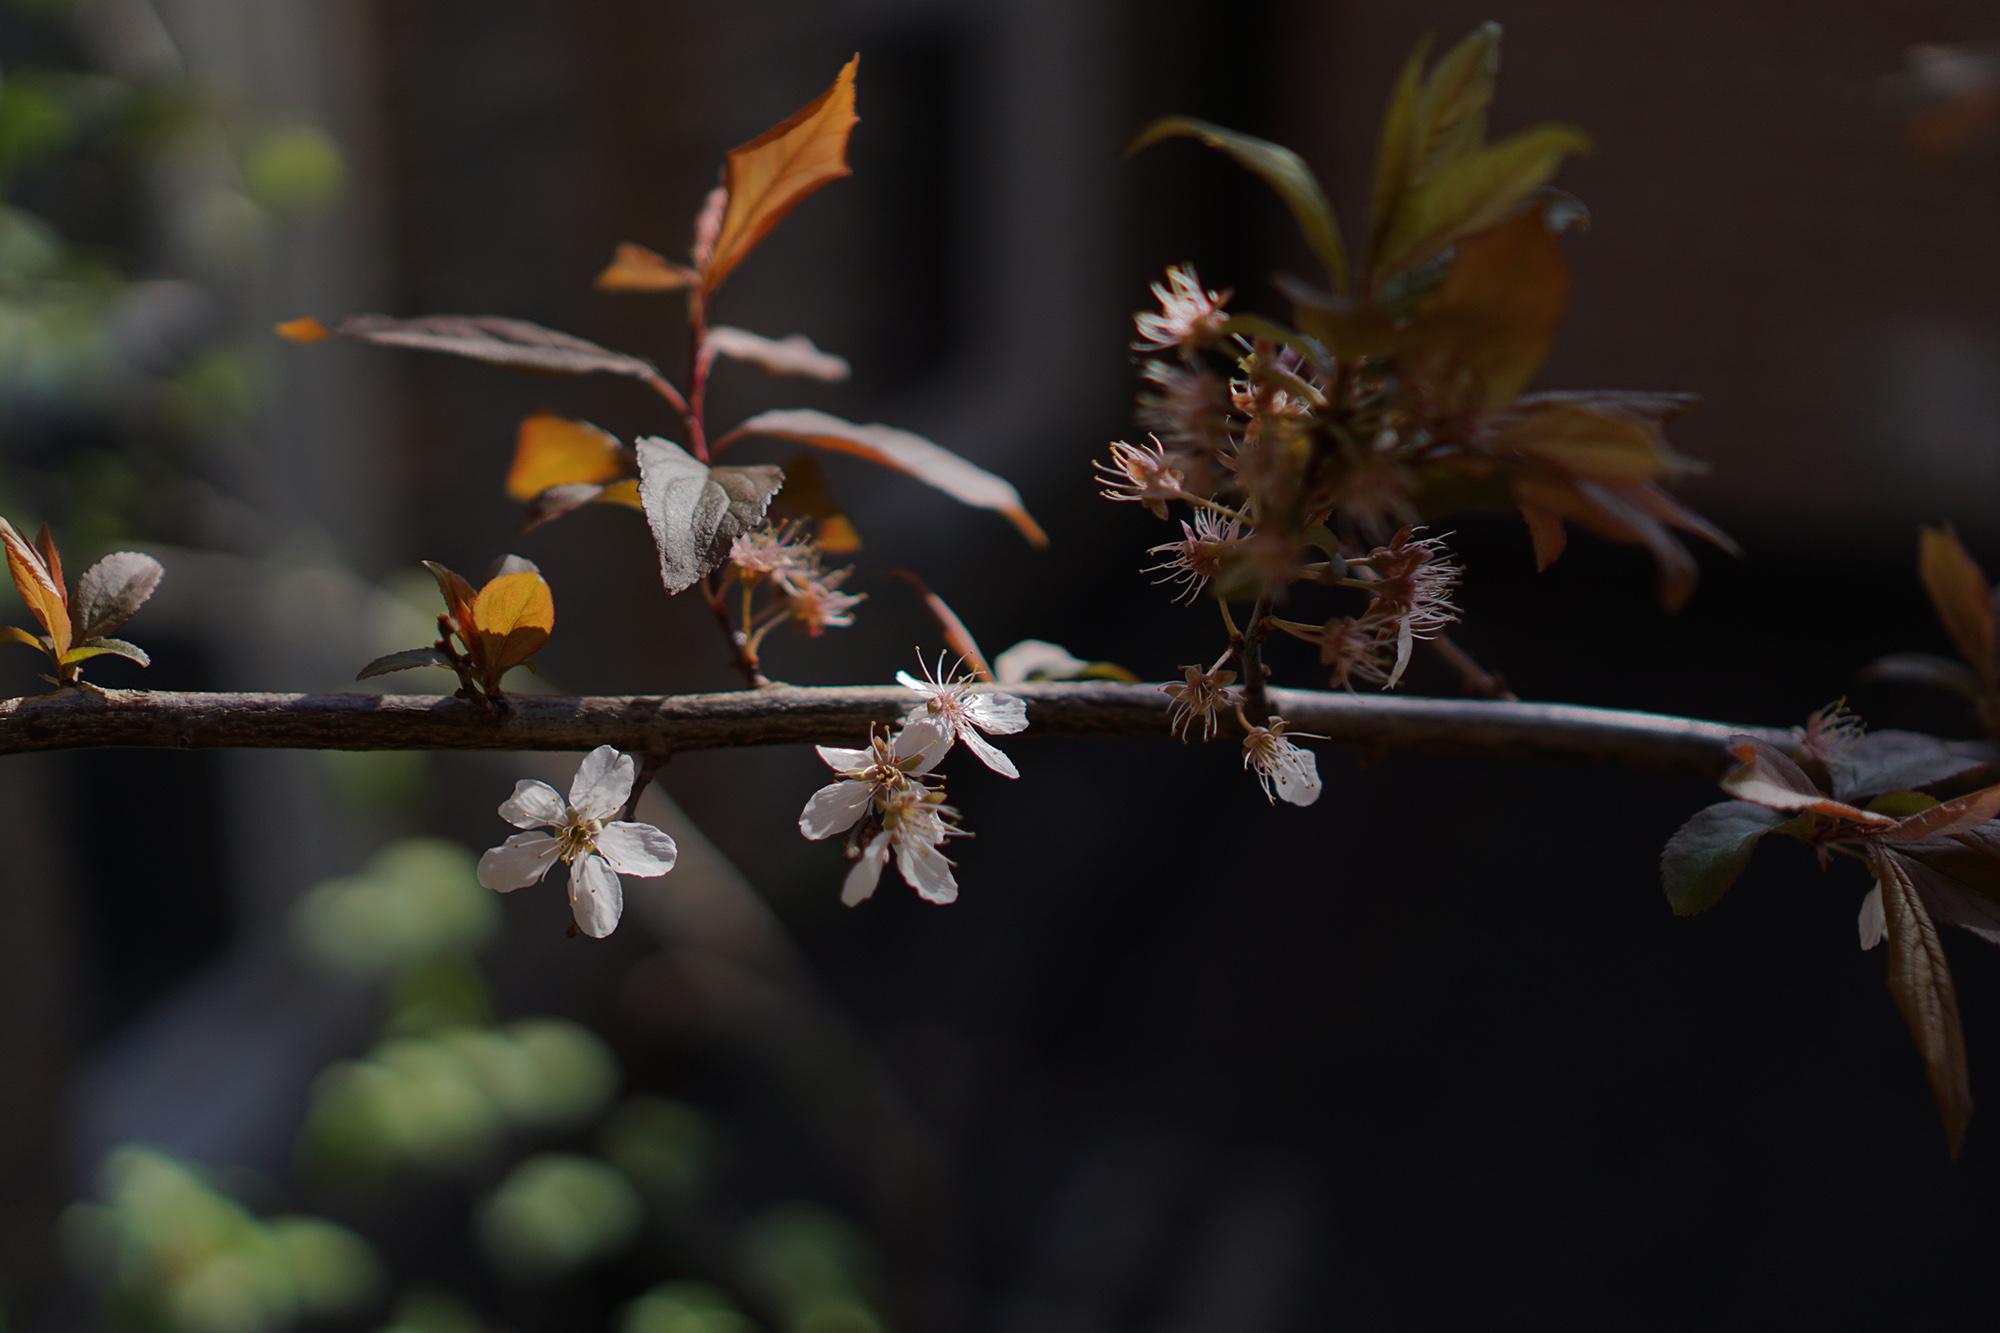 Purpleleaf Plum tree (Prunus cerasifera) flowers and leaves, Chicago IL / Darker than Green